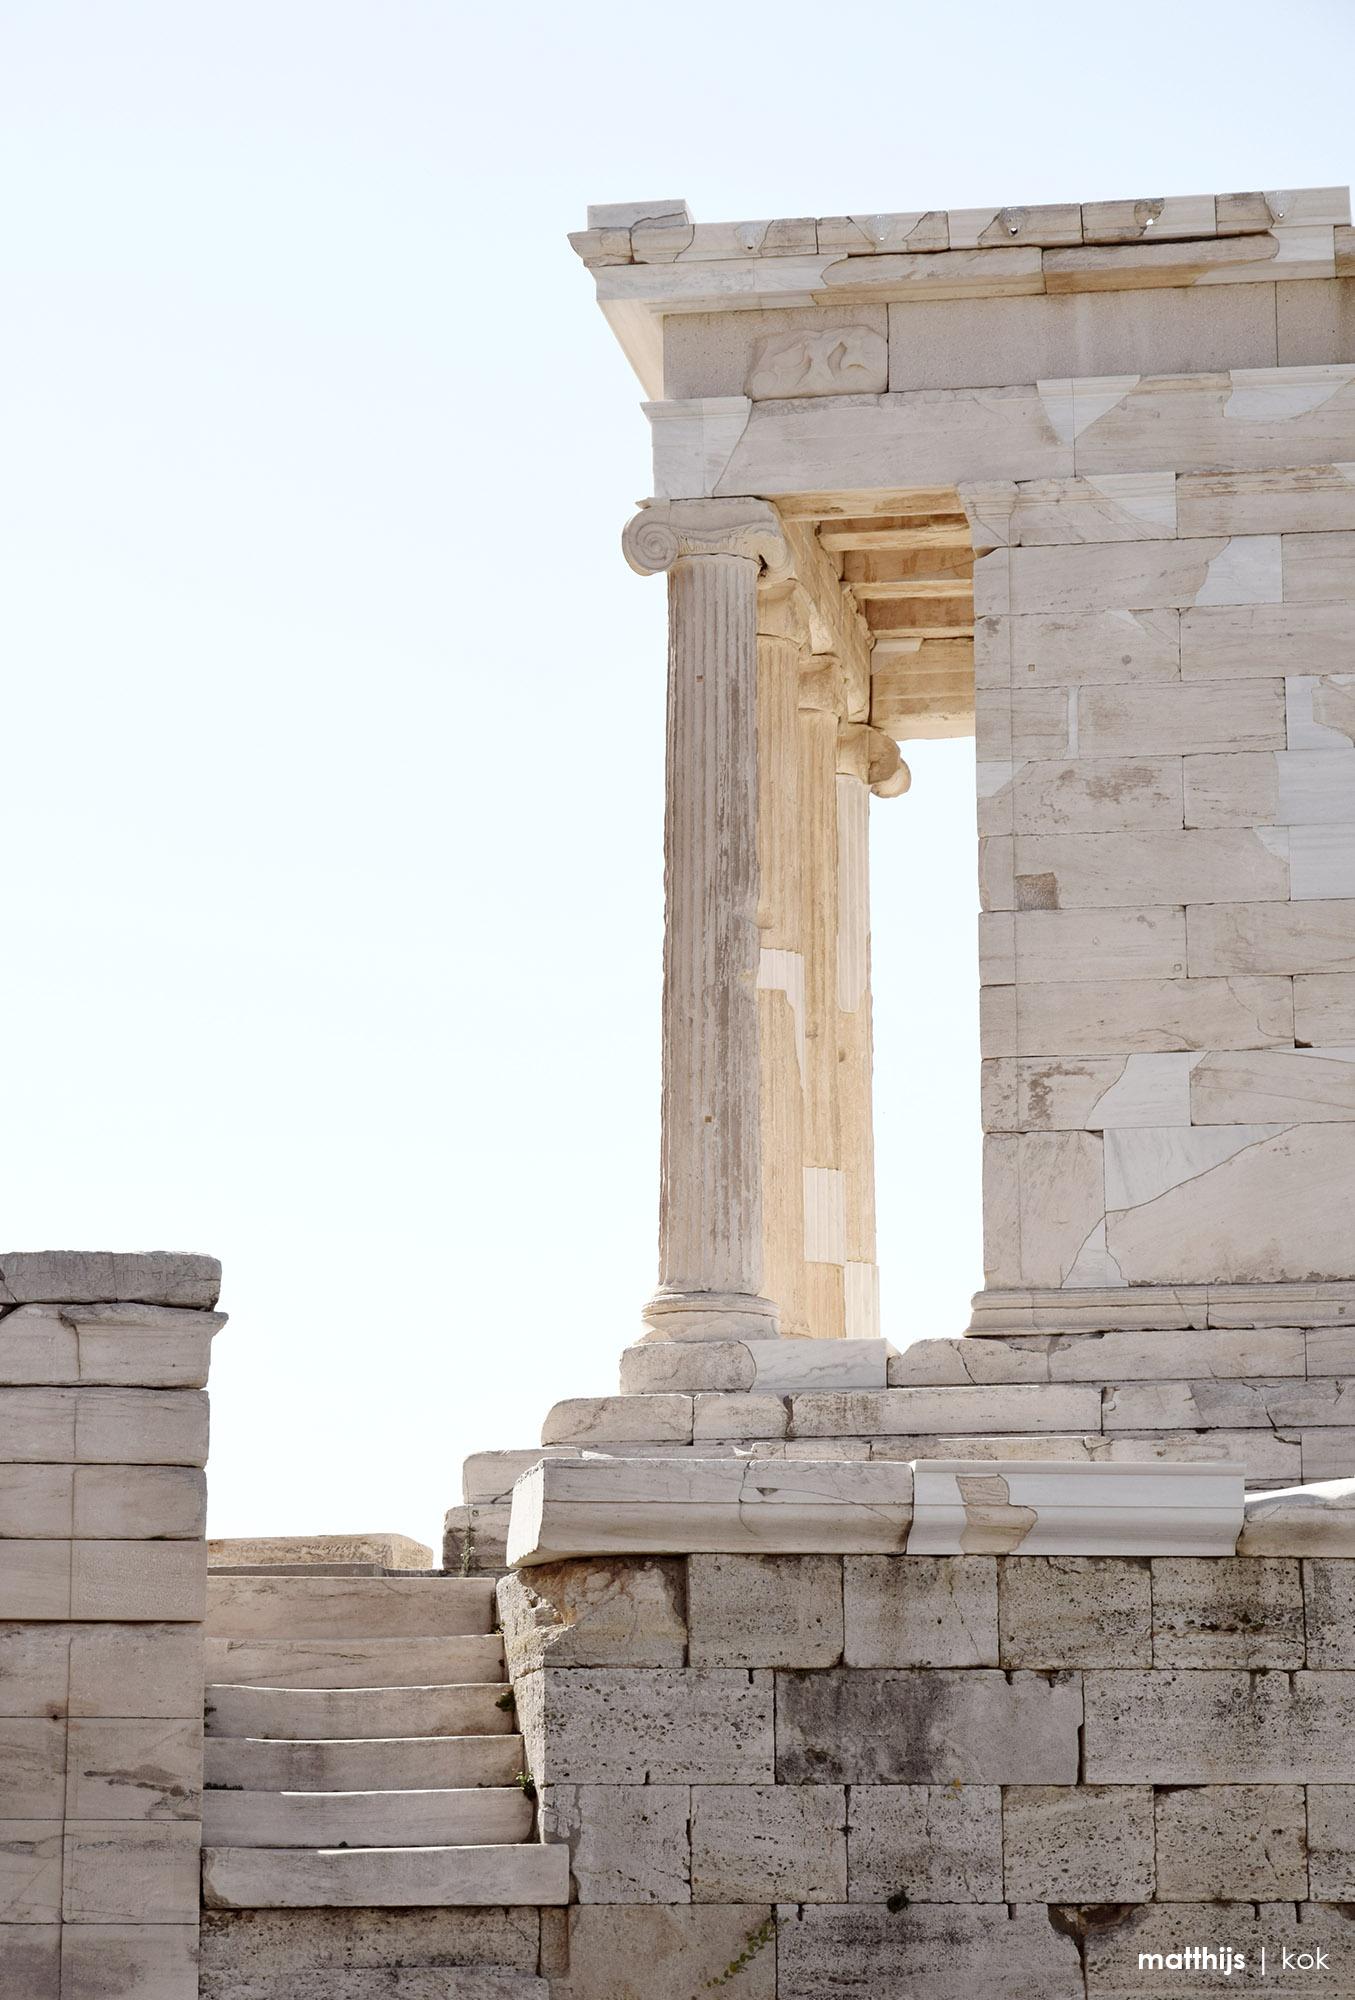 Temple of Athena Nike, Athens, Greece | Photo by Matthijs Kok